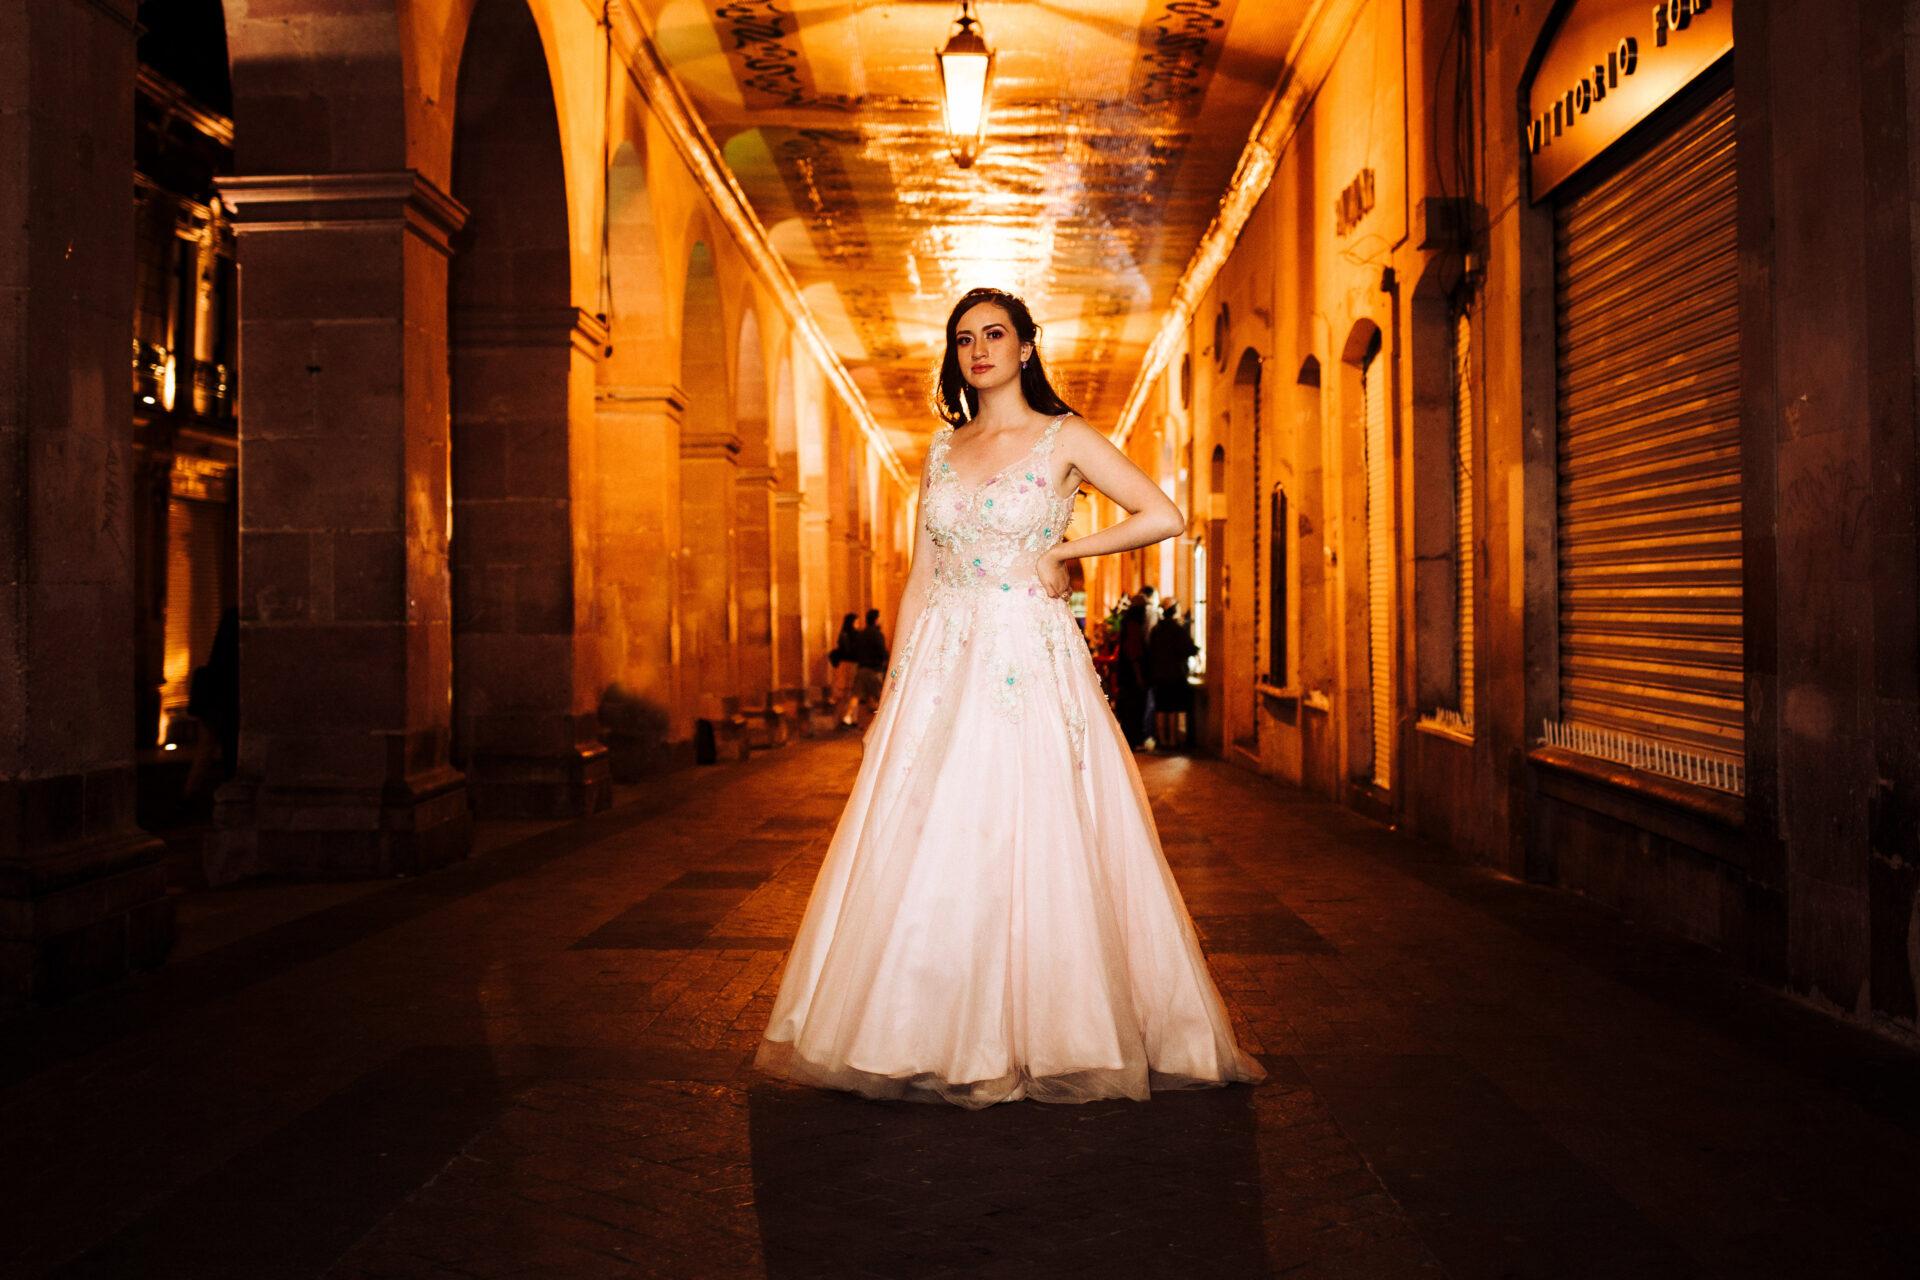 javier_noriega_fotografo_bodas_zacatecas_trash_the_dress_xv_años00007